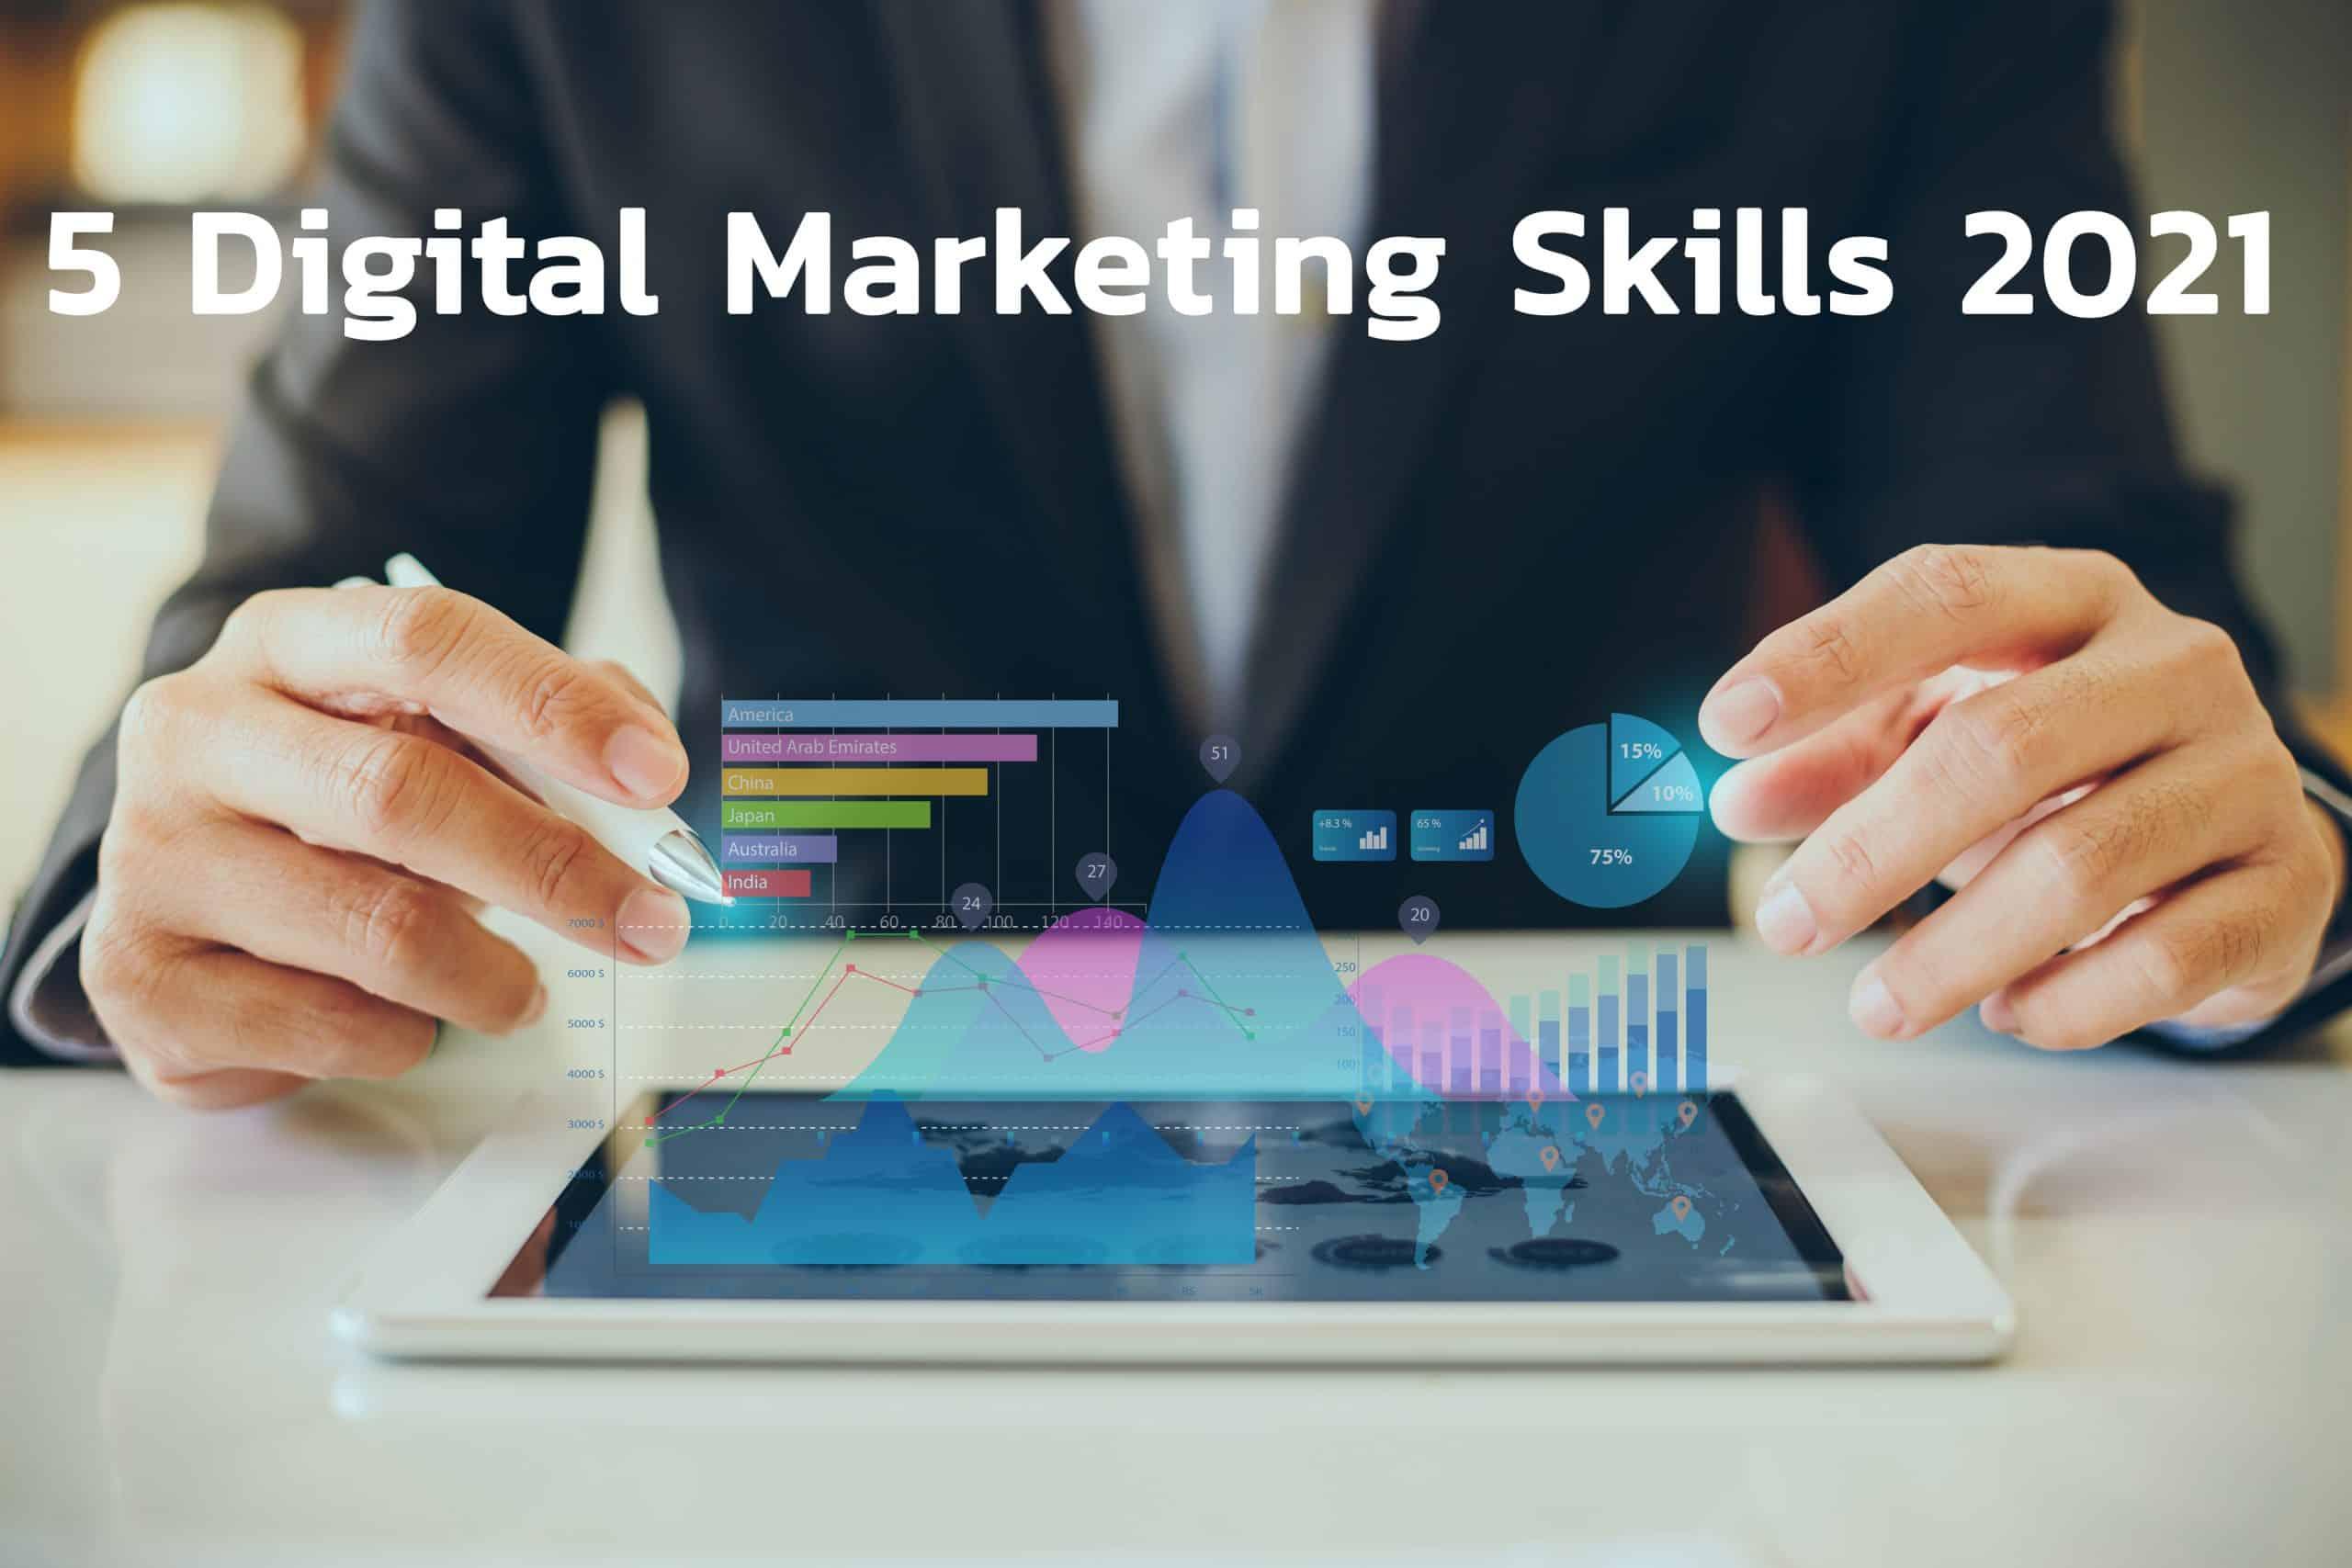 5 Digital Marketing Skills 2021 ทักษะนักการตลาดดิจิทัล